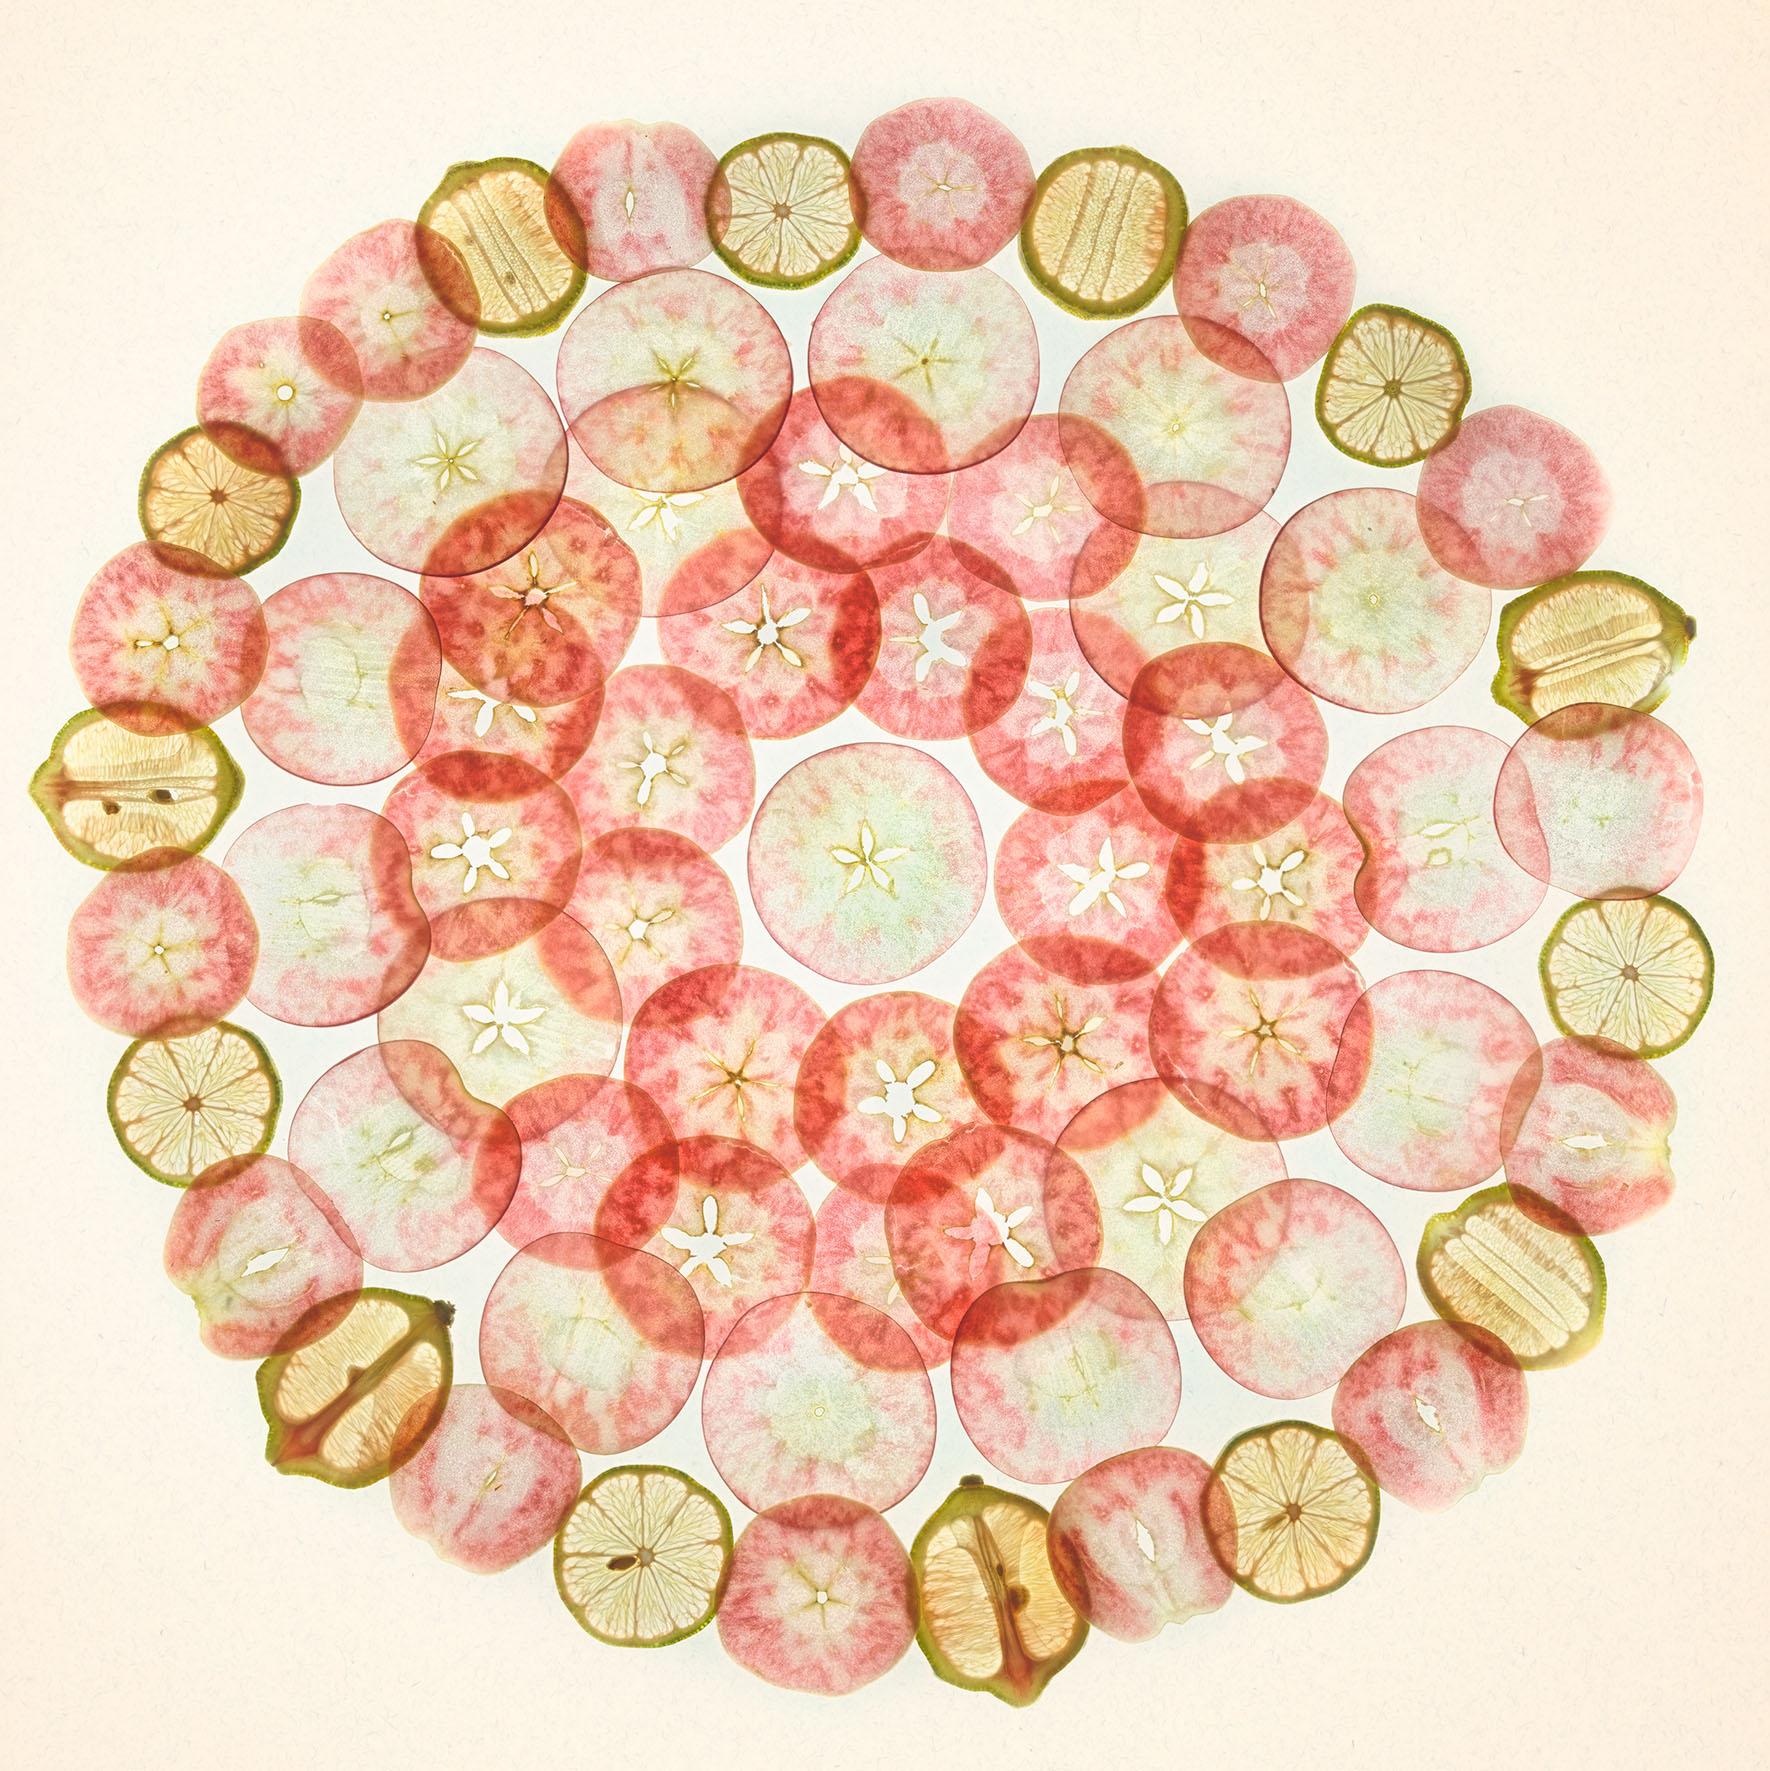 Lady Pink Apple Slices with Lemons © Harold Davis